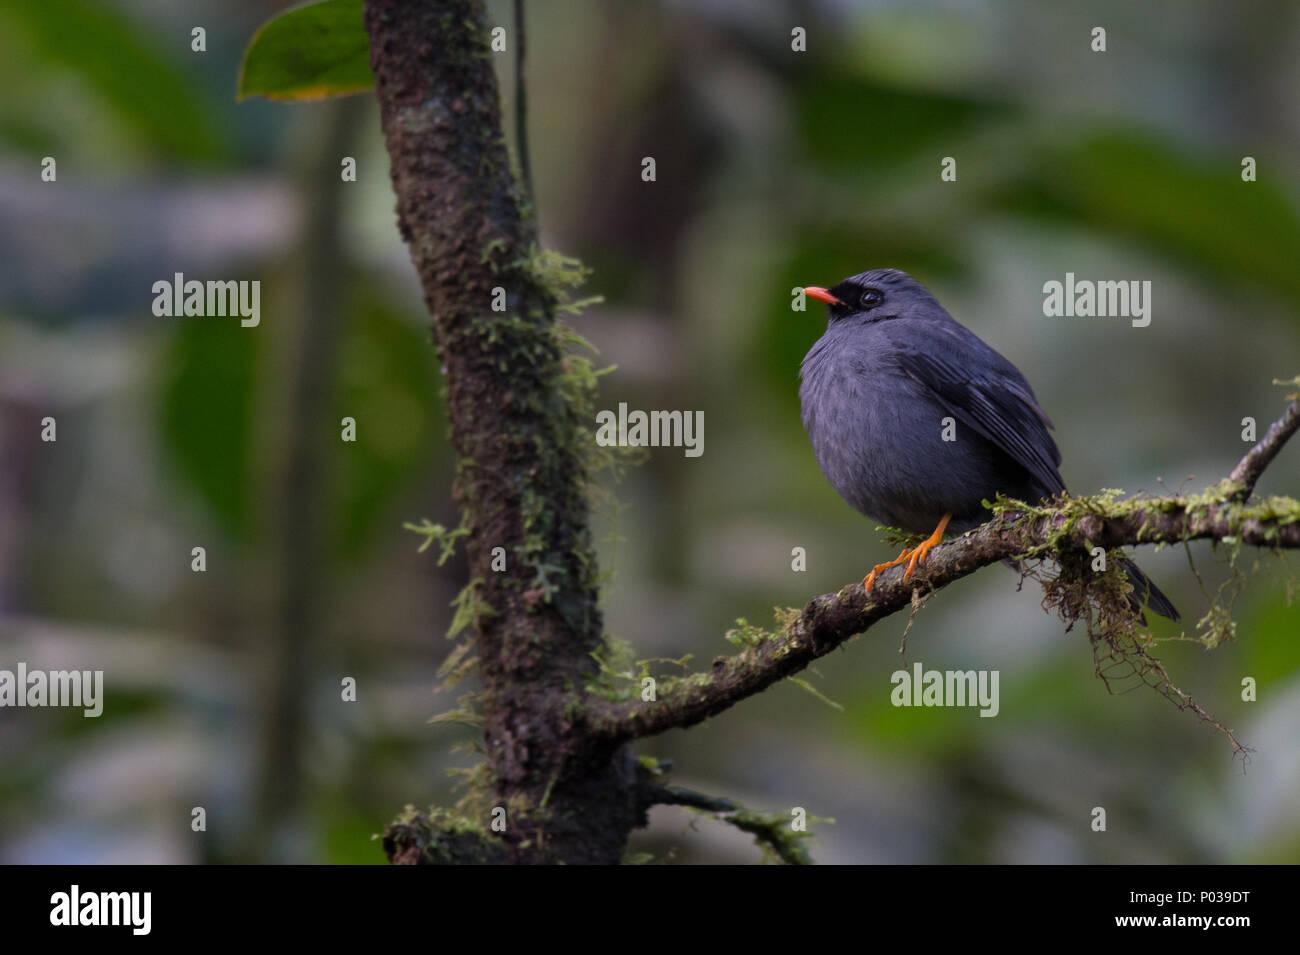 Black-faced Solitaire, Myadestes melanops,  Turdidae, Monteverde Cloud Forest Reserve, Costa Rica - Stock Image